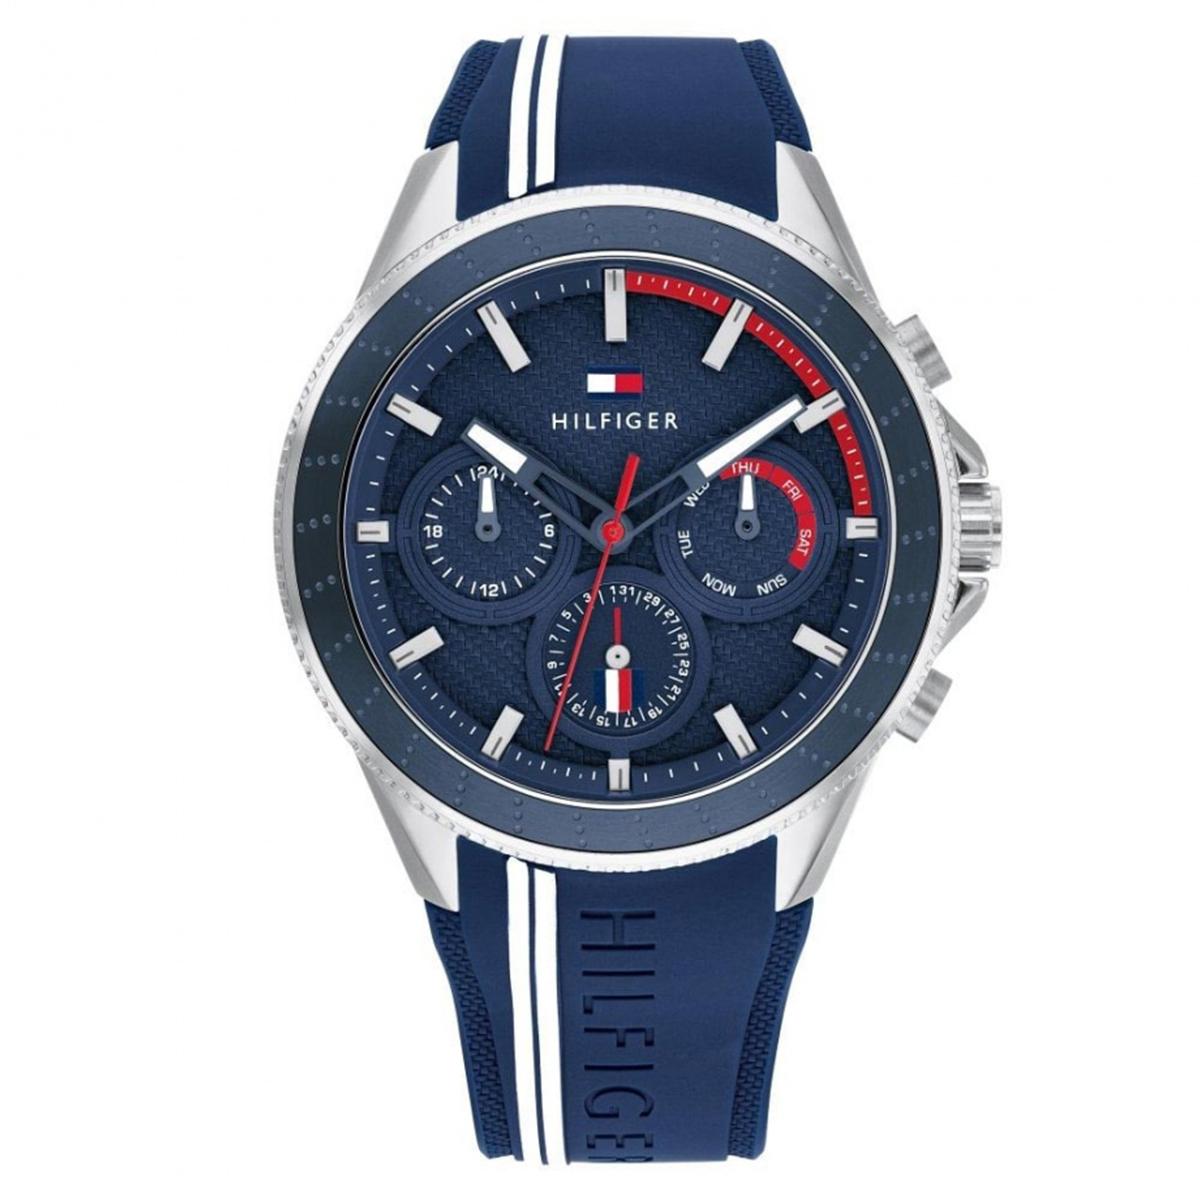 TOMMY HILFIGER トミーヒルフィガー 時計 腕時計 送料無料 1791859 全品送料無料 営業 ブランド クォーツ アナログ 使い勝手の良い メンズ